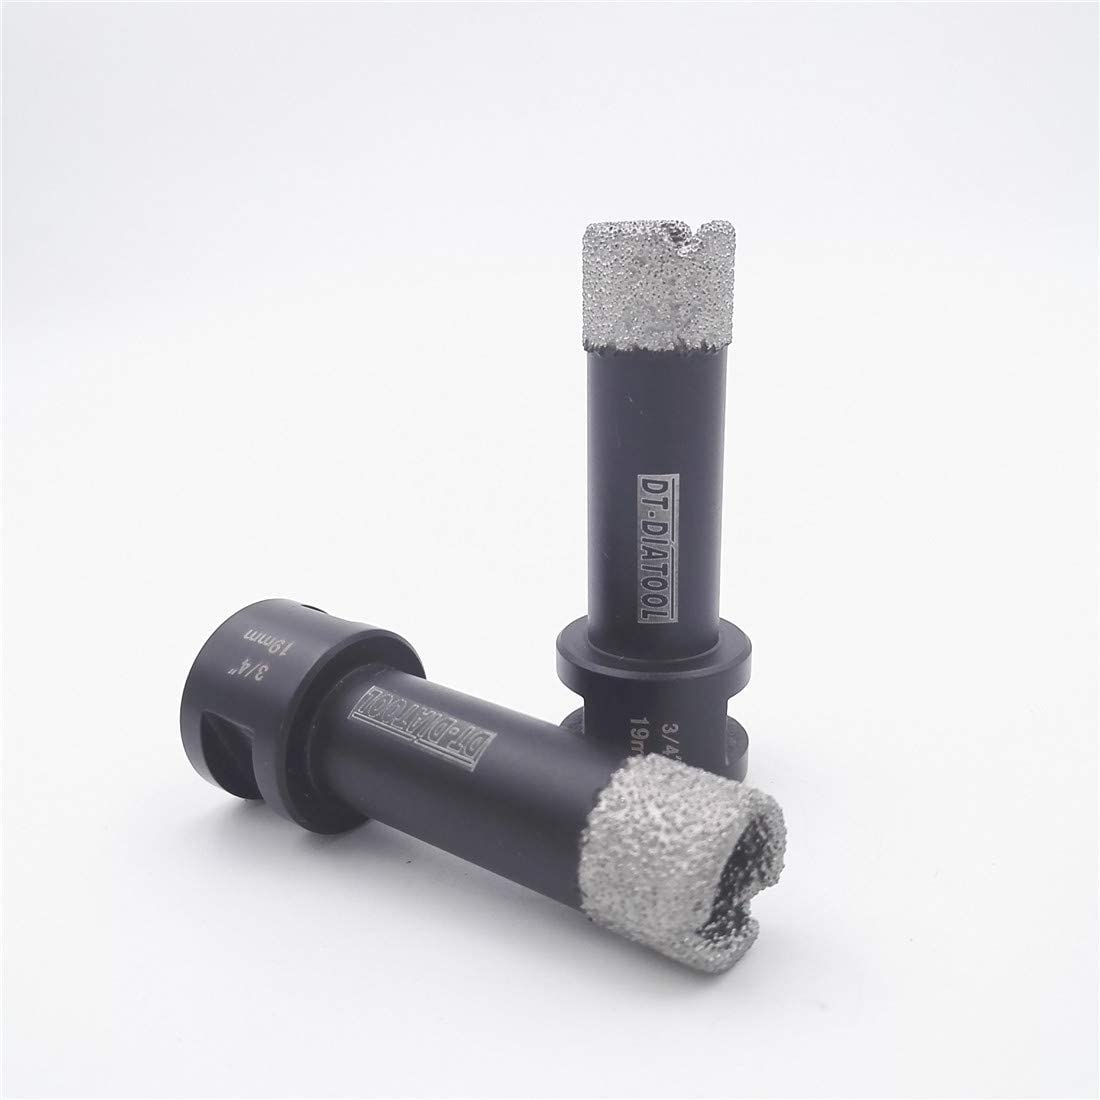 DT-DIATOOL 1-3//8 Inch Diamond Drill Bits for Tile Granite Marble Stone Brick Diameter 35mm